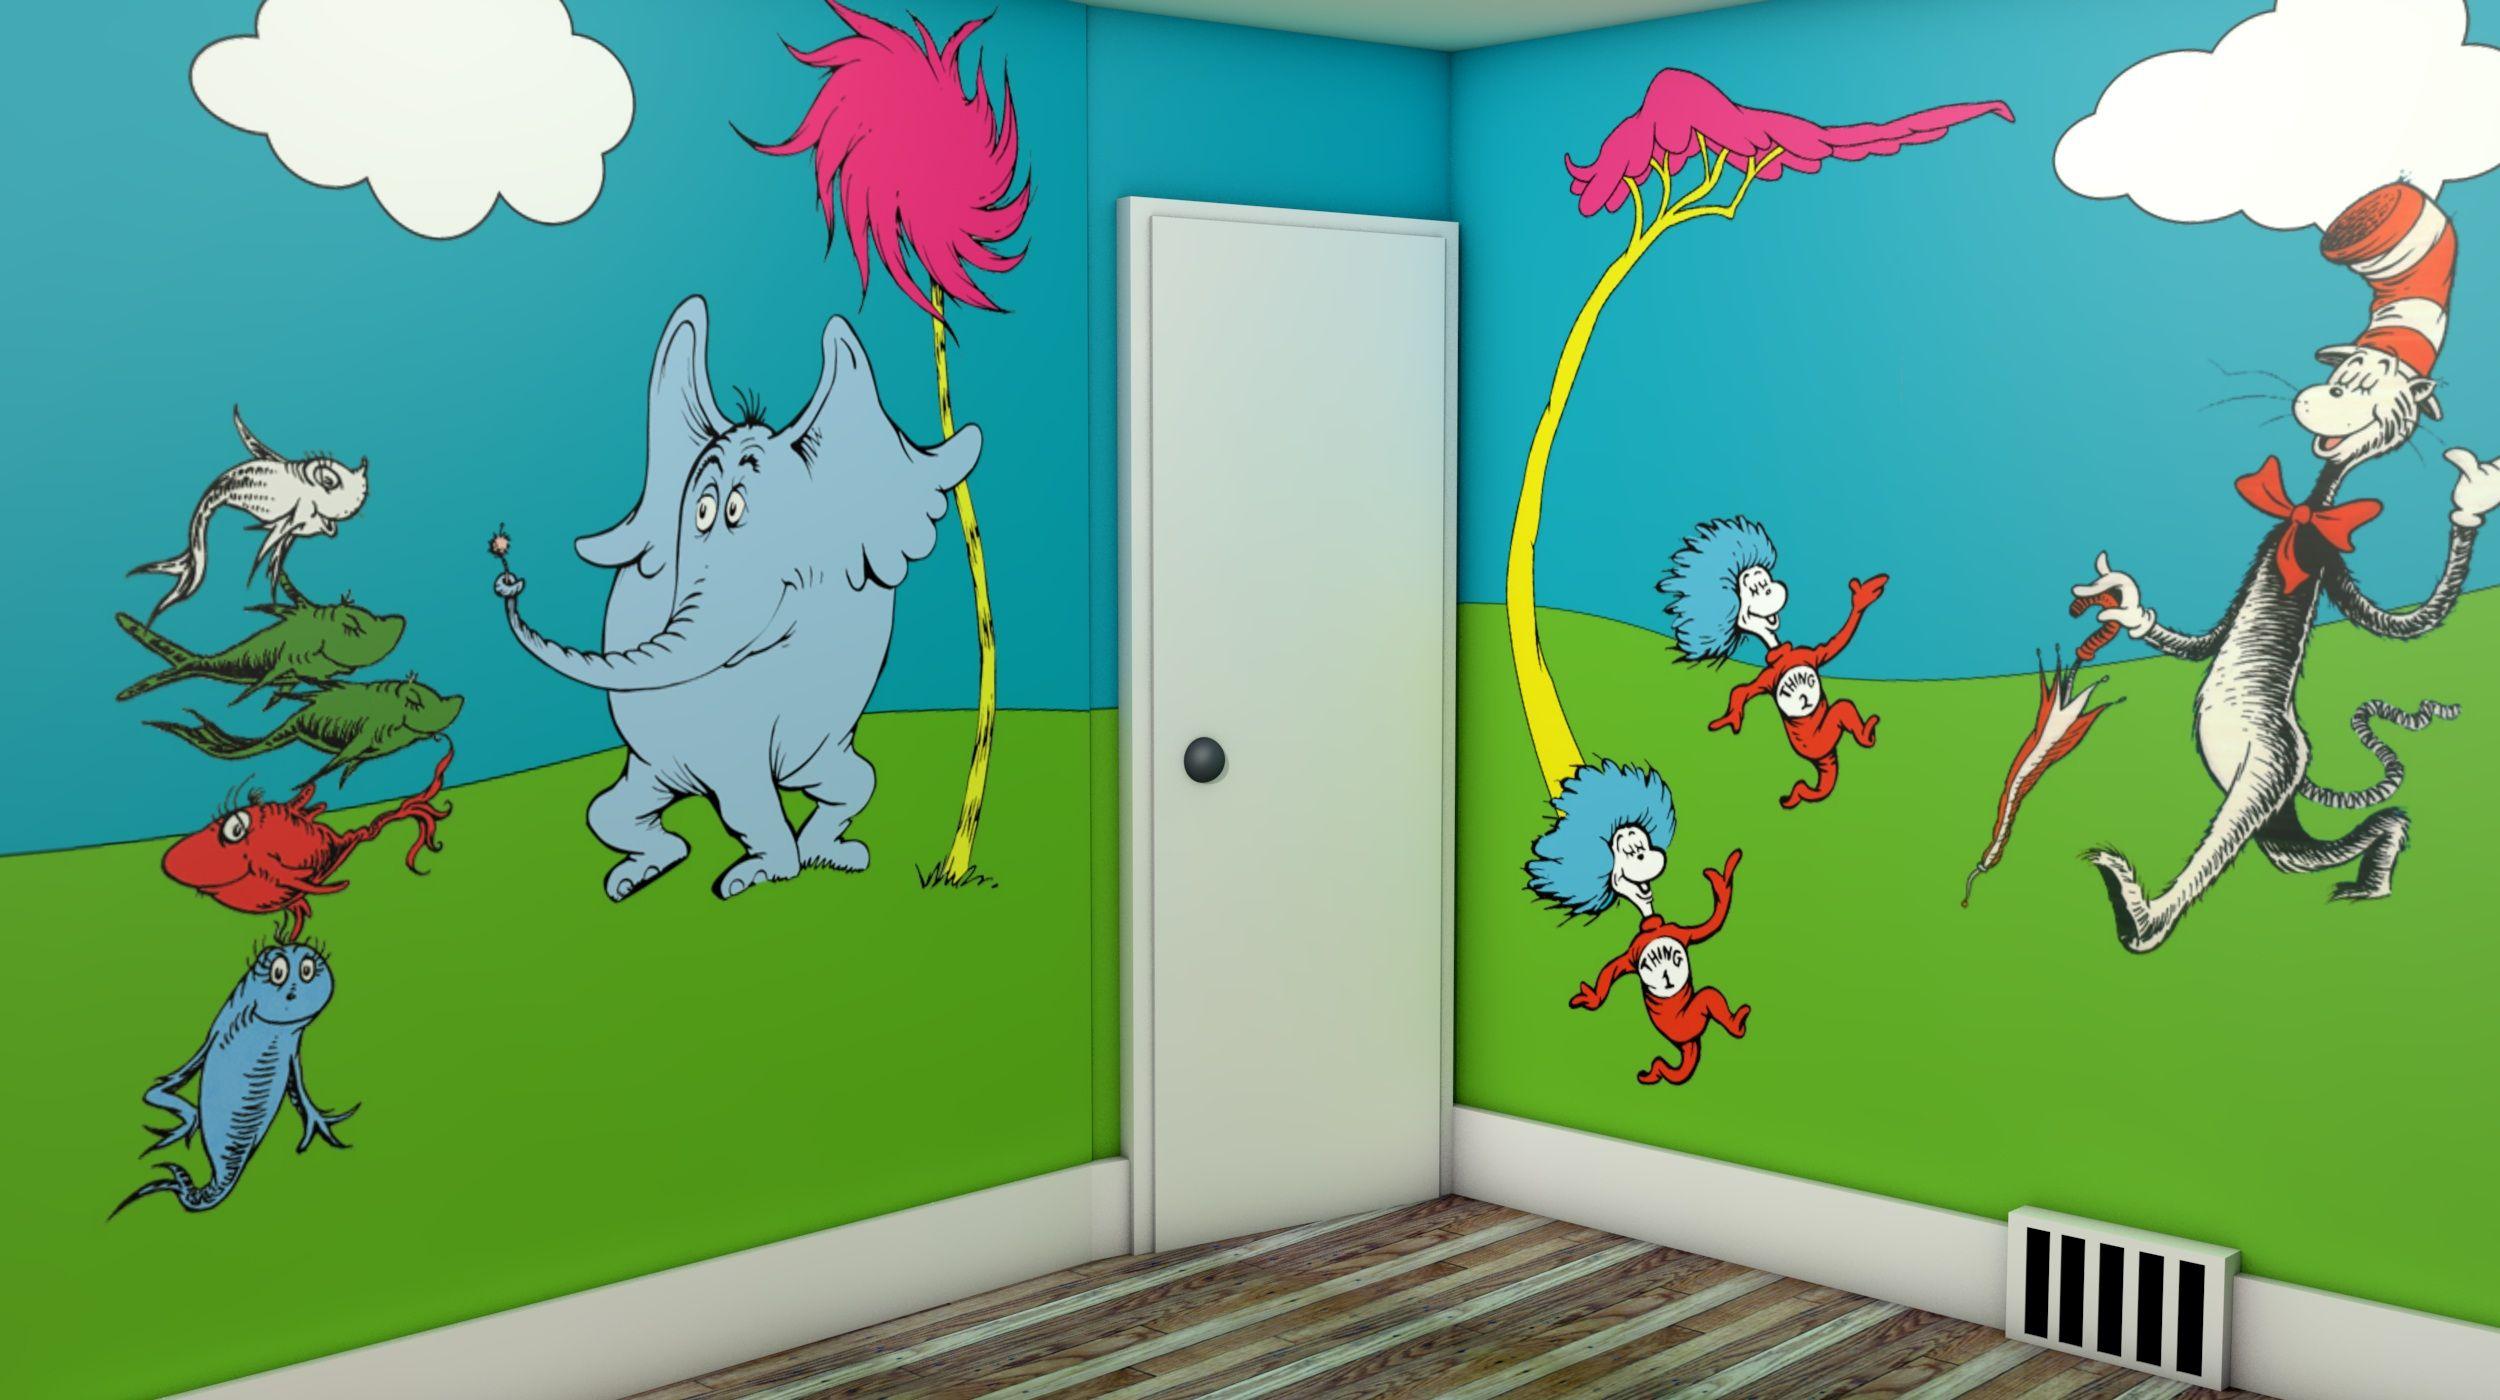 Image Result For Dr Seuss Wall Murals Dr Seuss Nursery Dr Seuss Mural Baby Nursery Themes